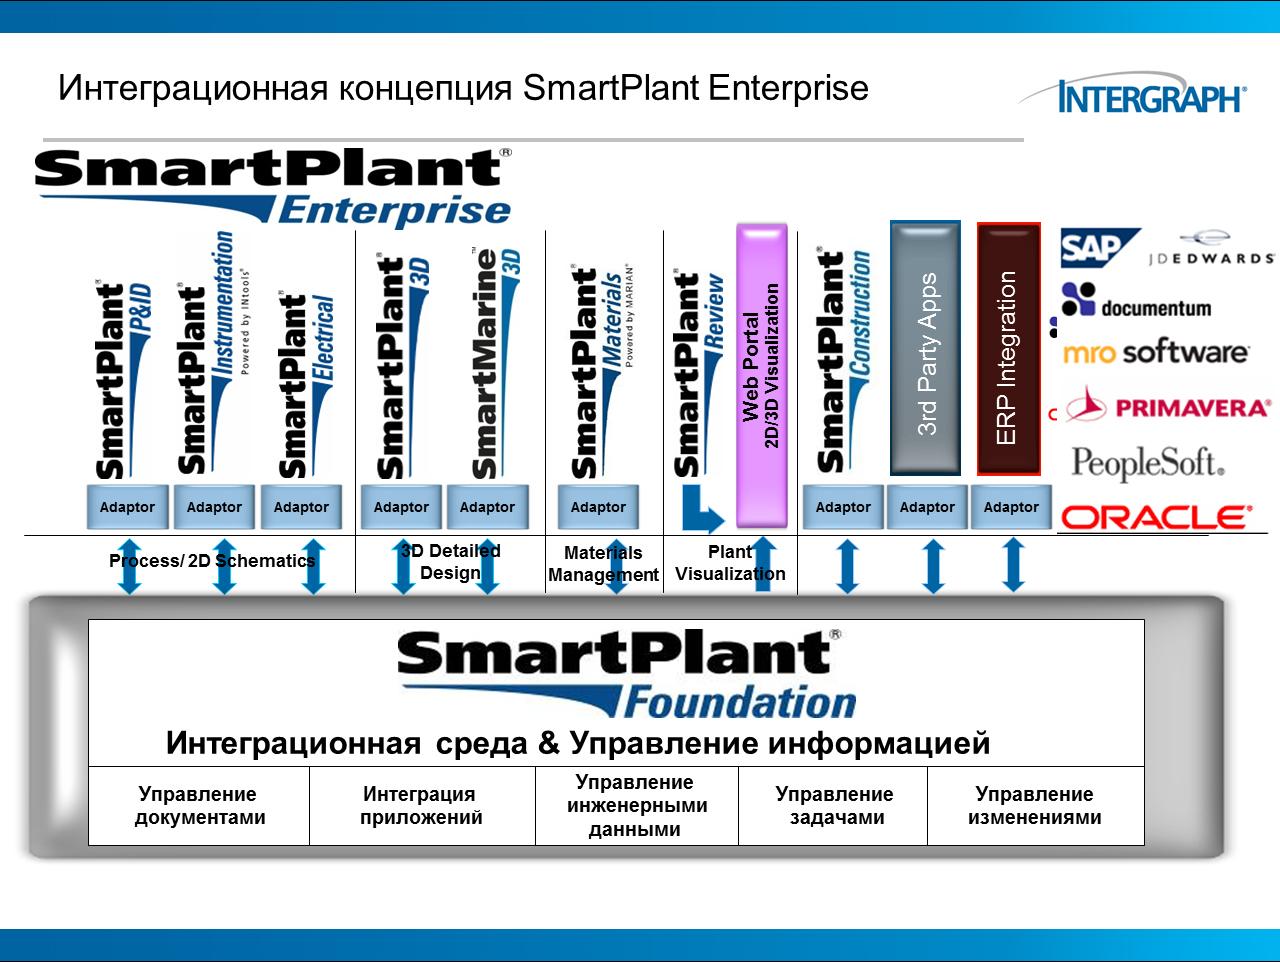 Smartplant on feedyeti smartplant20enterprise201 feedyeti 52ffdbbc4b7afe946cec8e3a12c92c17 fandeluxe Image collections